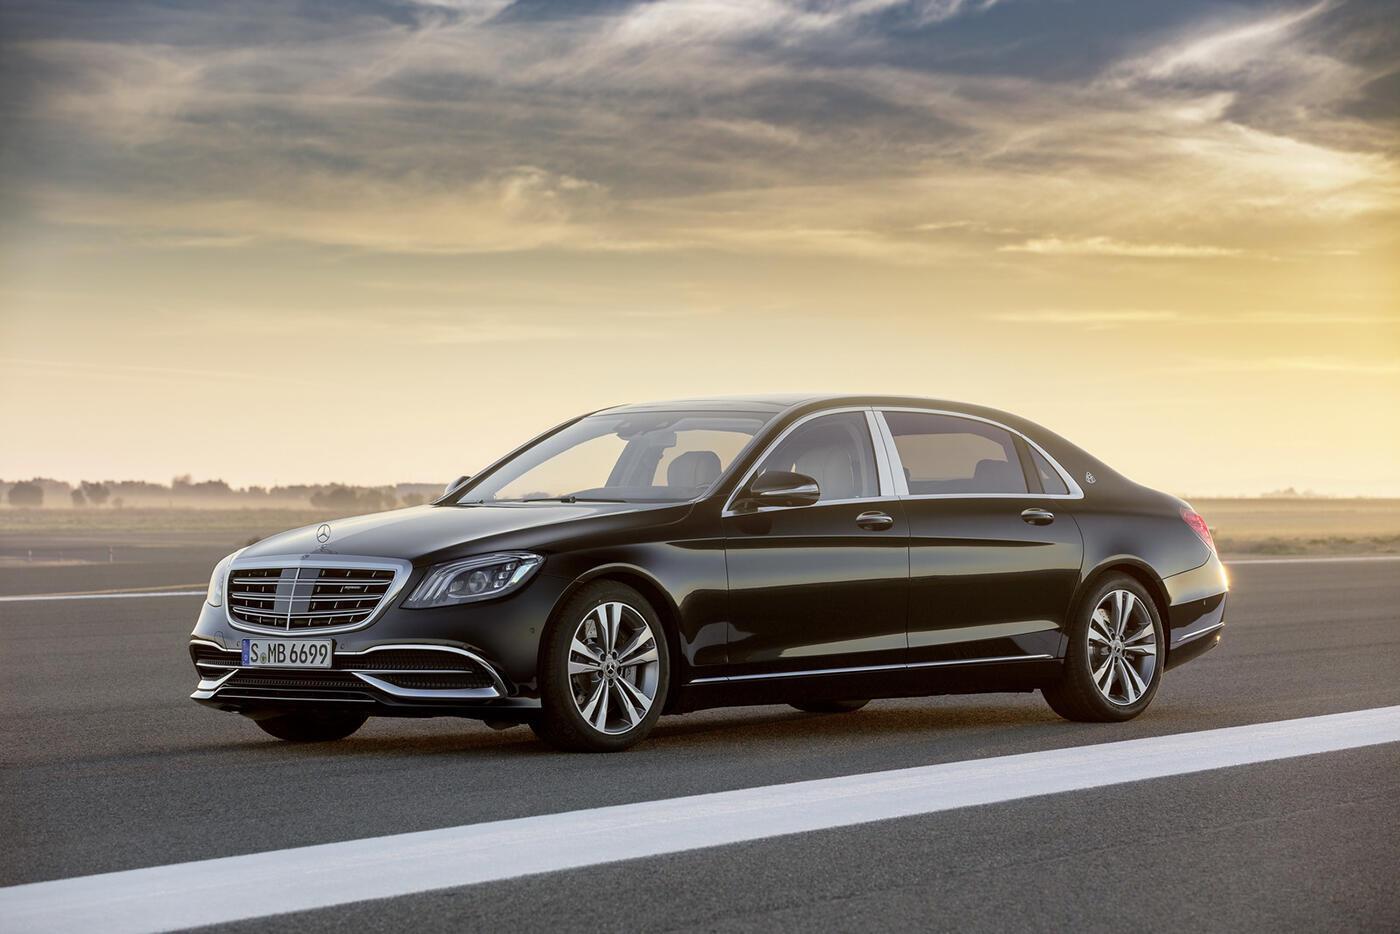 Ảnh chi tiết Mercedes-Benz S-Class 2018 - Hình 7